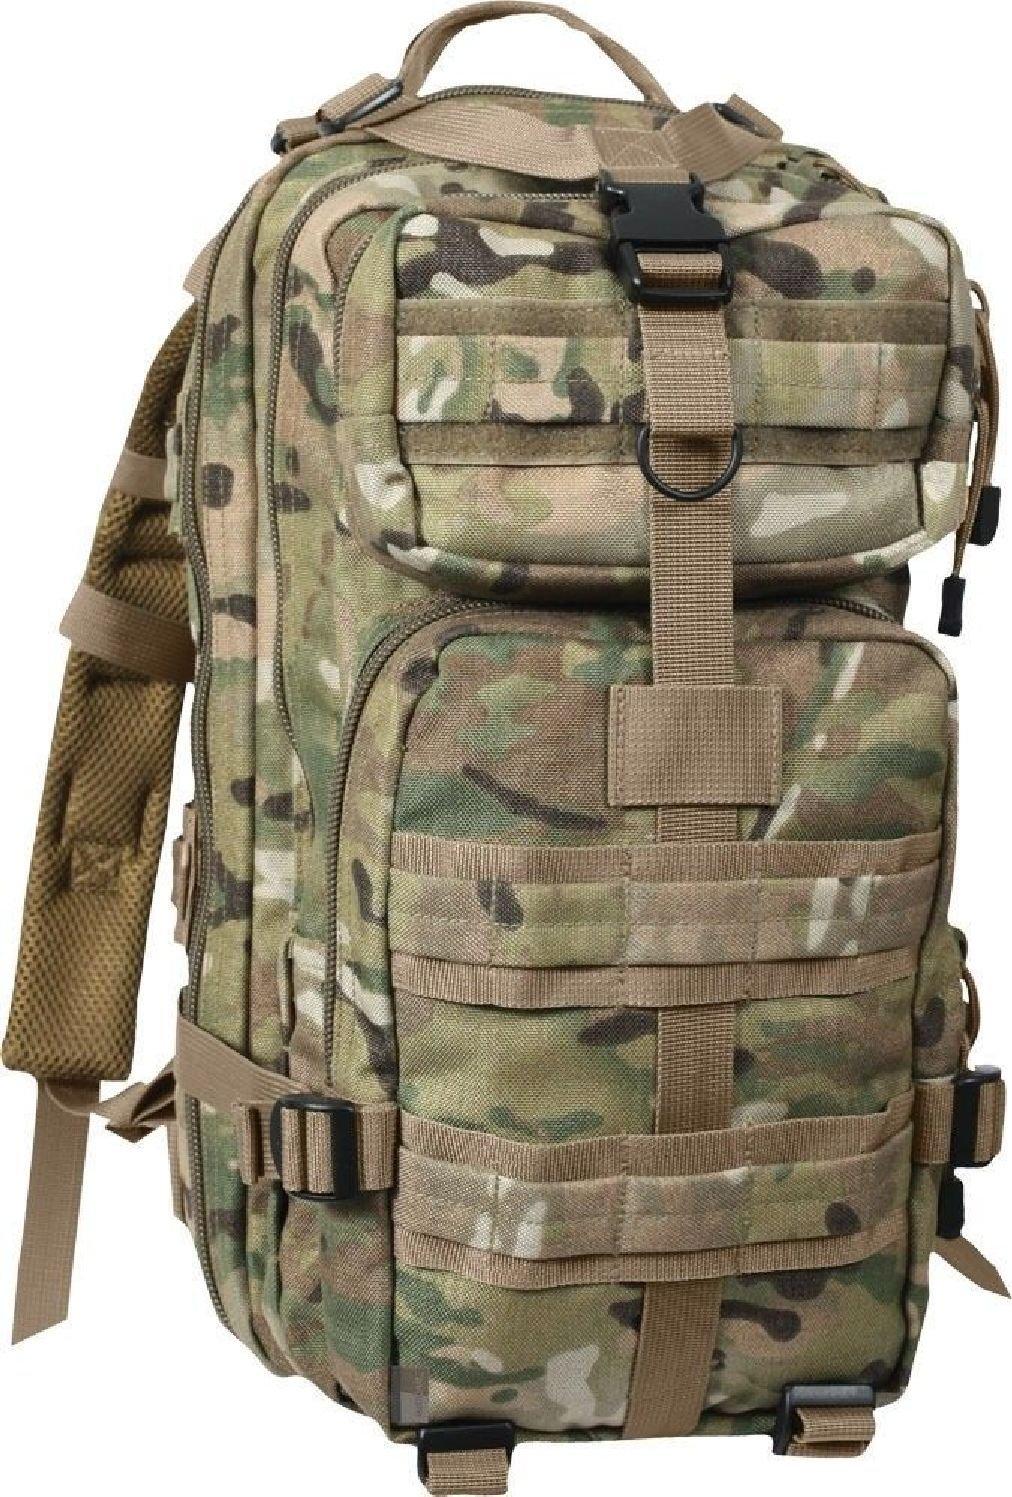 Tactical Medium Transport PackミリタリーバックパックレベルIII assaultバッグ B07DS6N3L4 Multi Cam